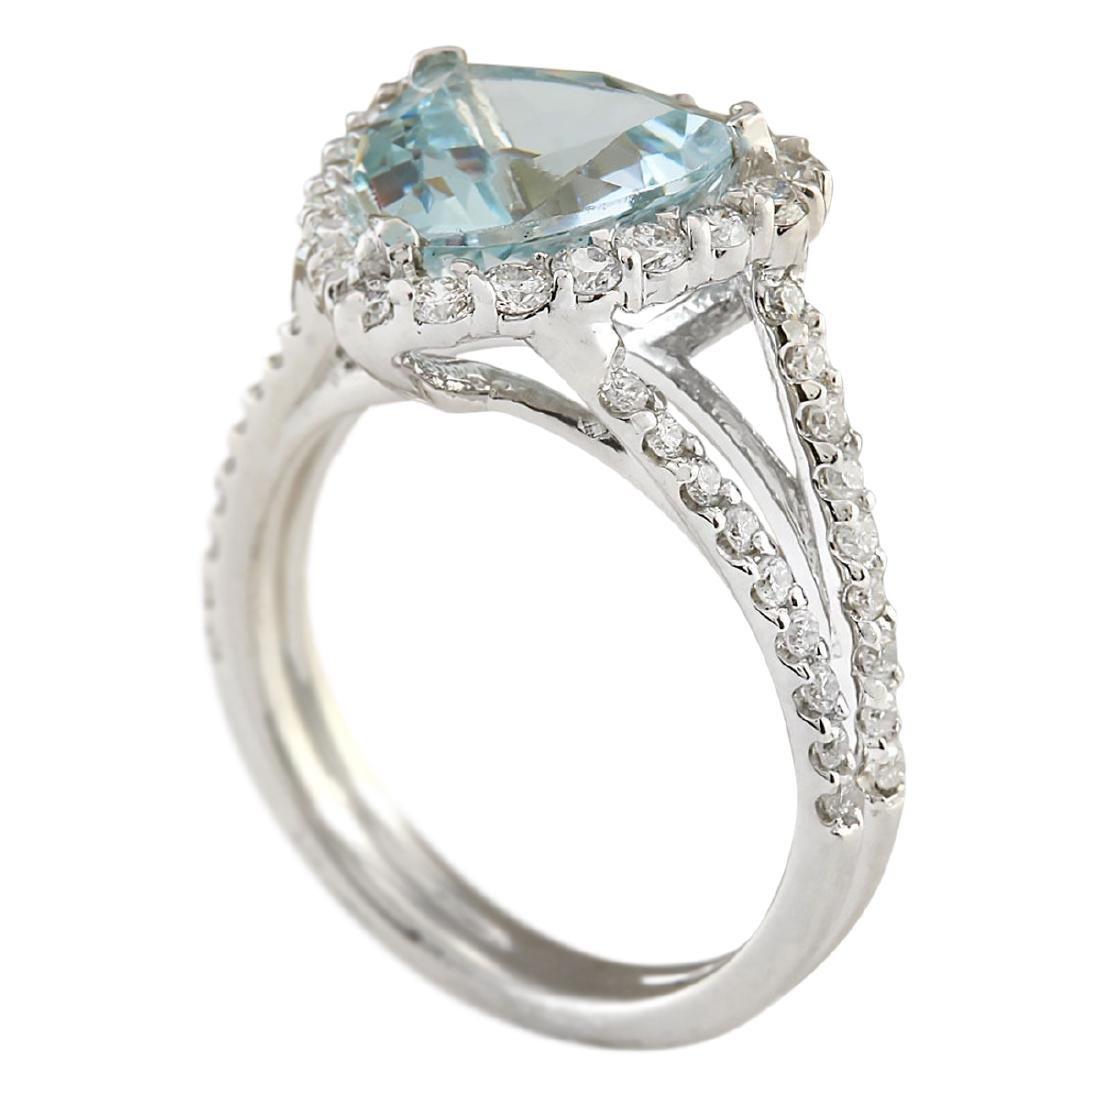 3.52 CTW Natural Aquamarine And Diamond Ring In 18K - 3